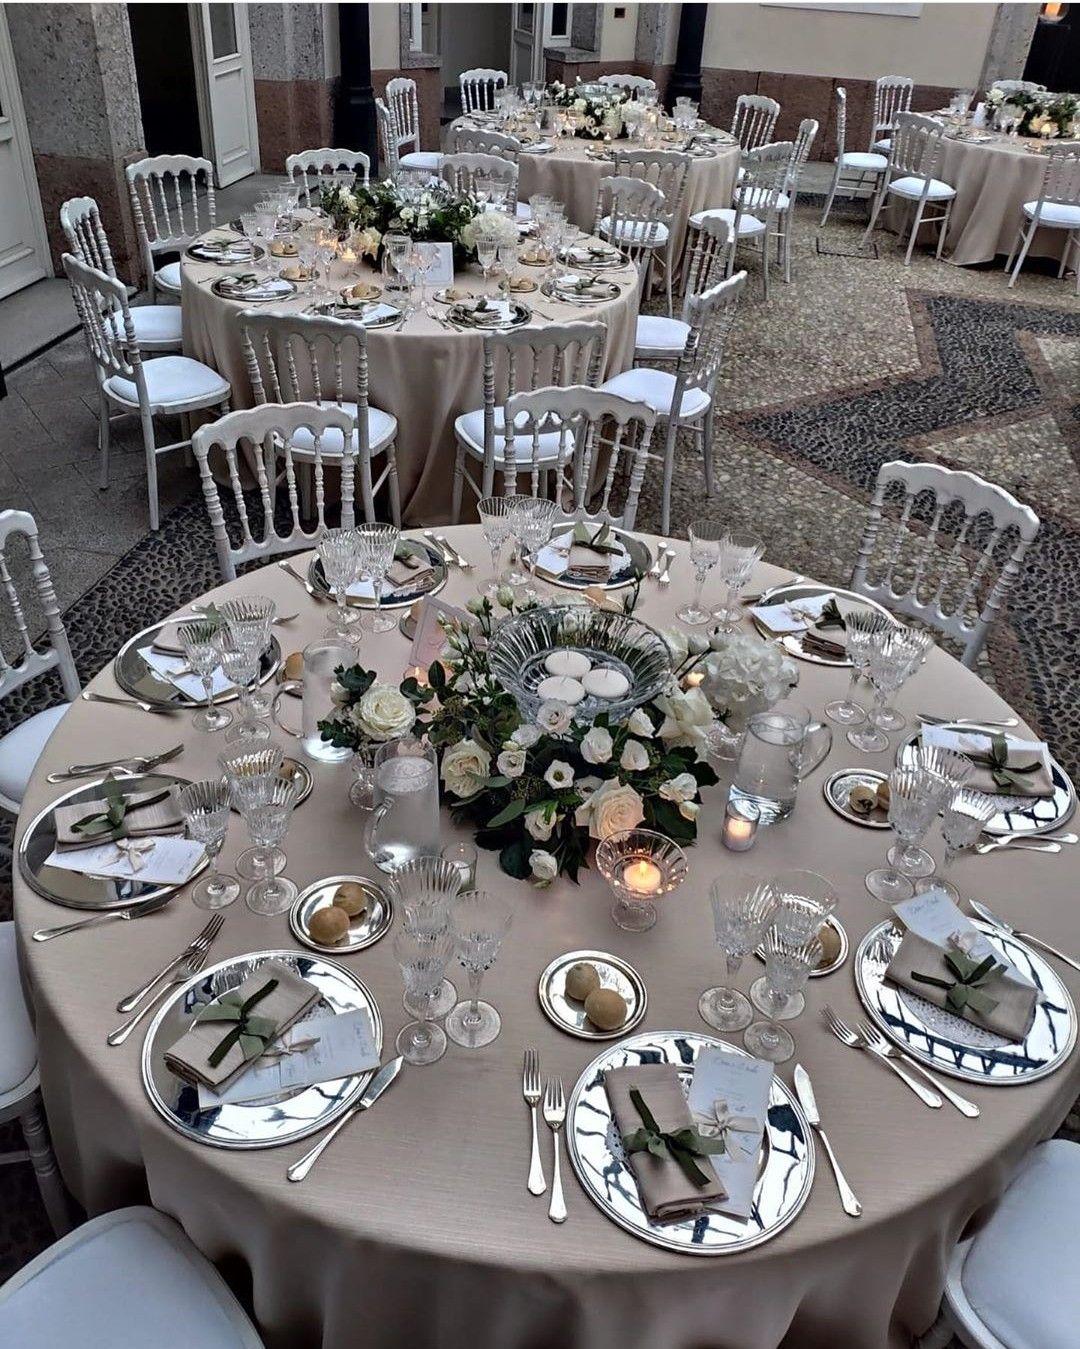 Elegante Allestimento Tavoli Matrimonio By Tondini Catering Varese Tavolo Matrimonio Decorazioni Da Tavola Di Nozze Matrimonio Floreale